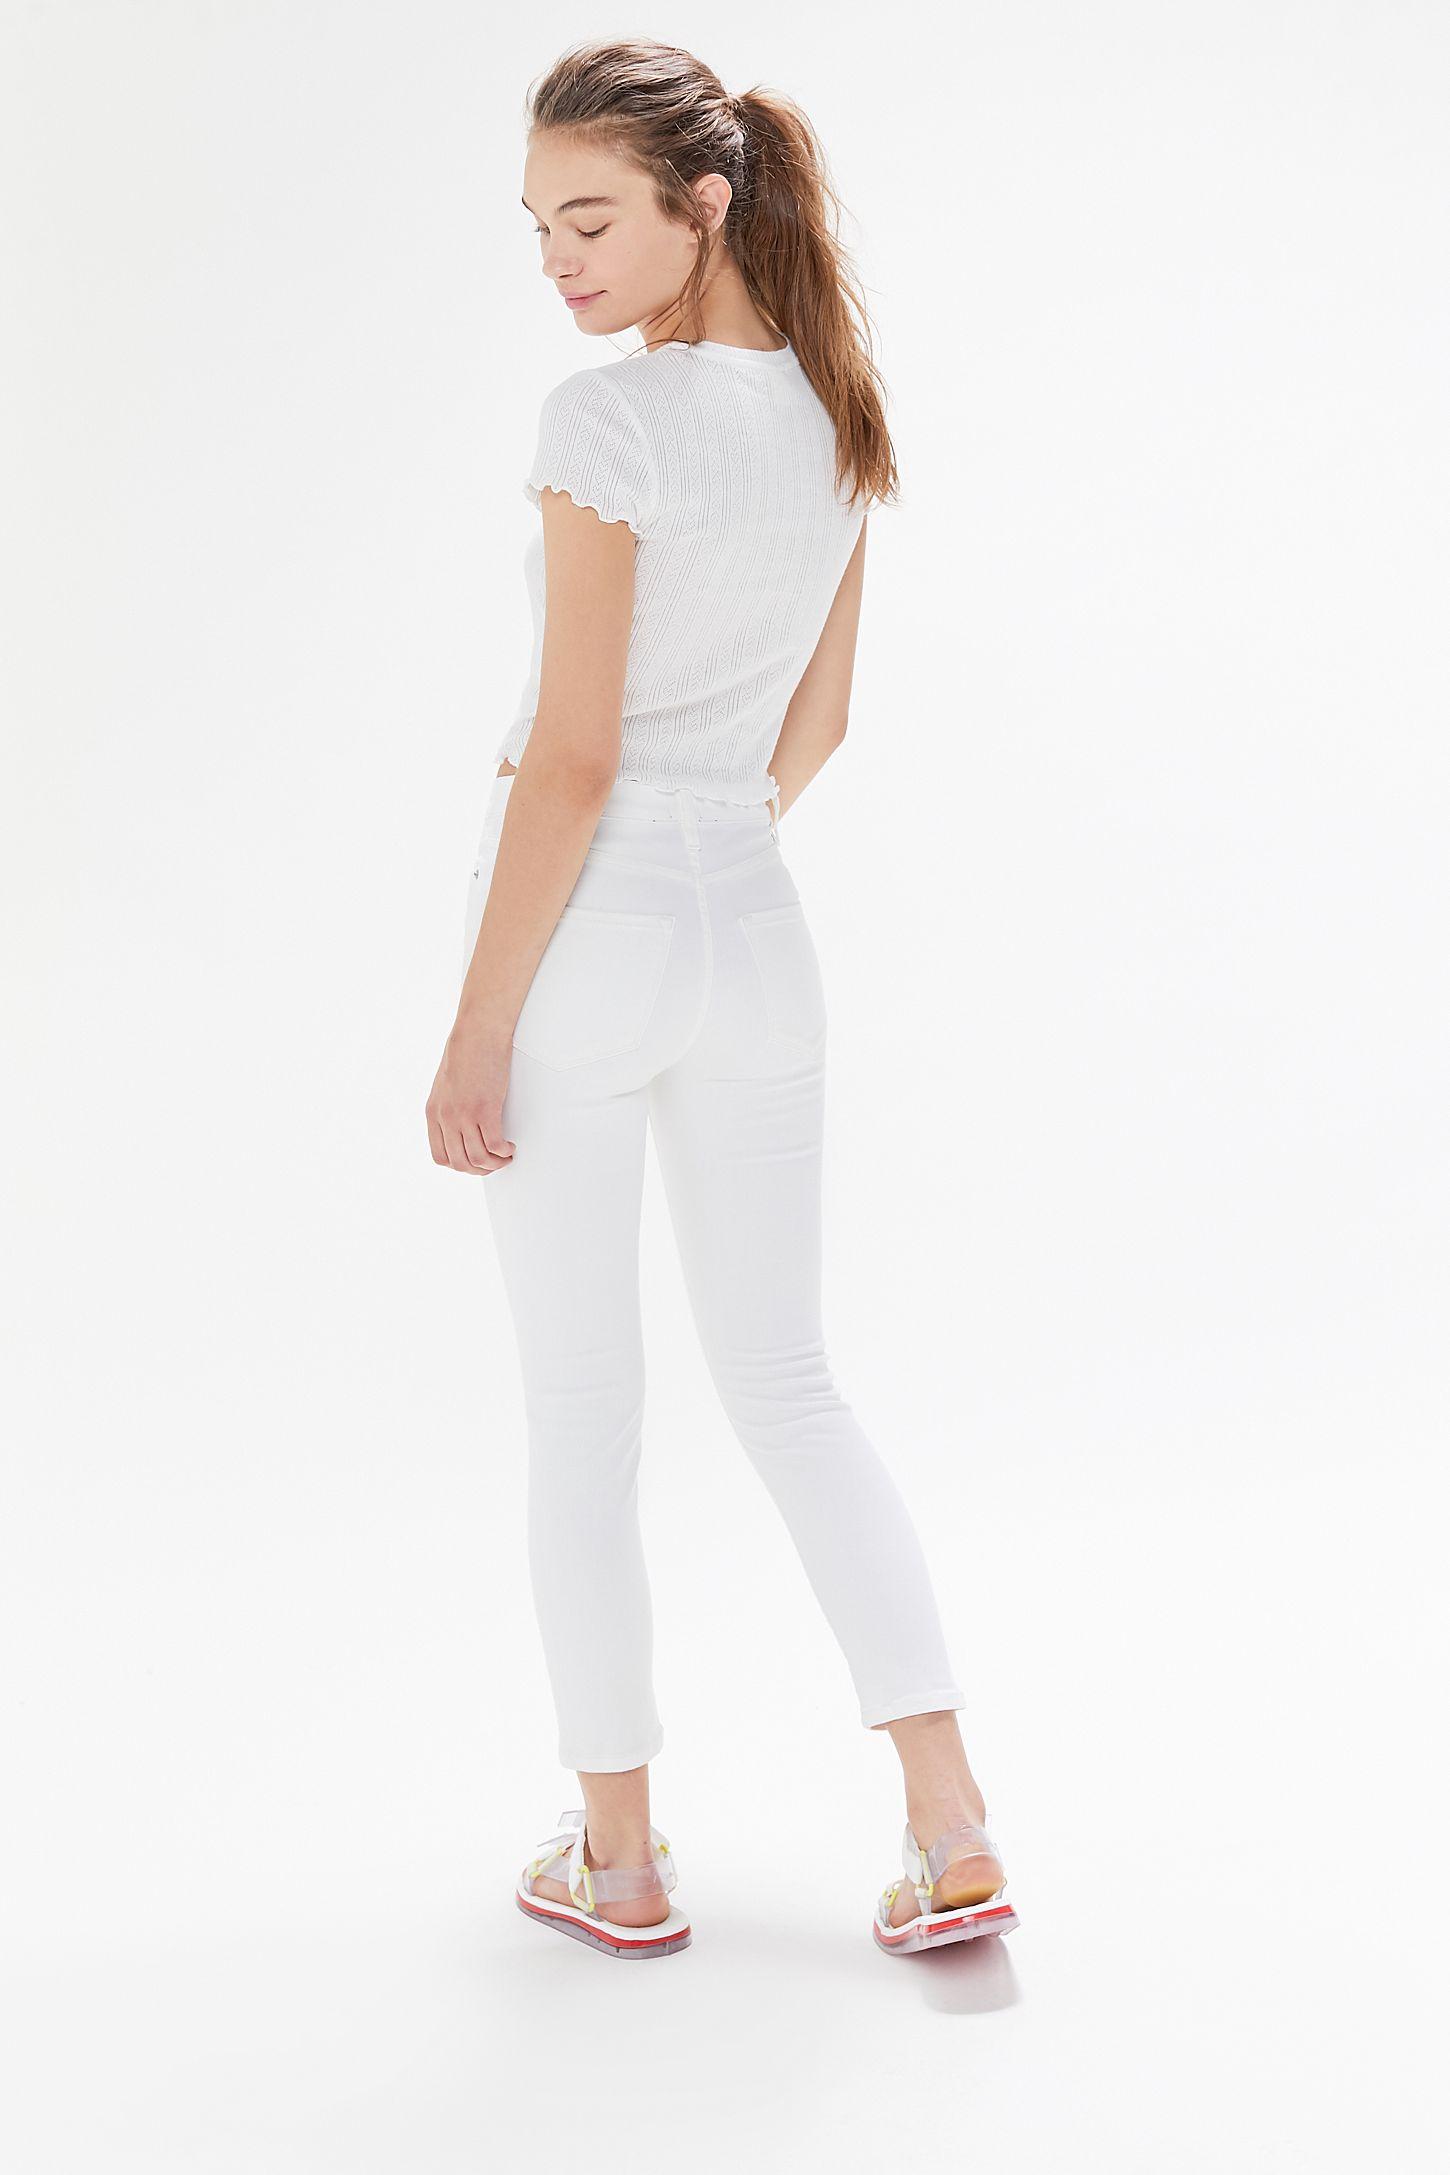 Jean Blanc Taille Haute 2